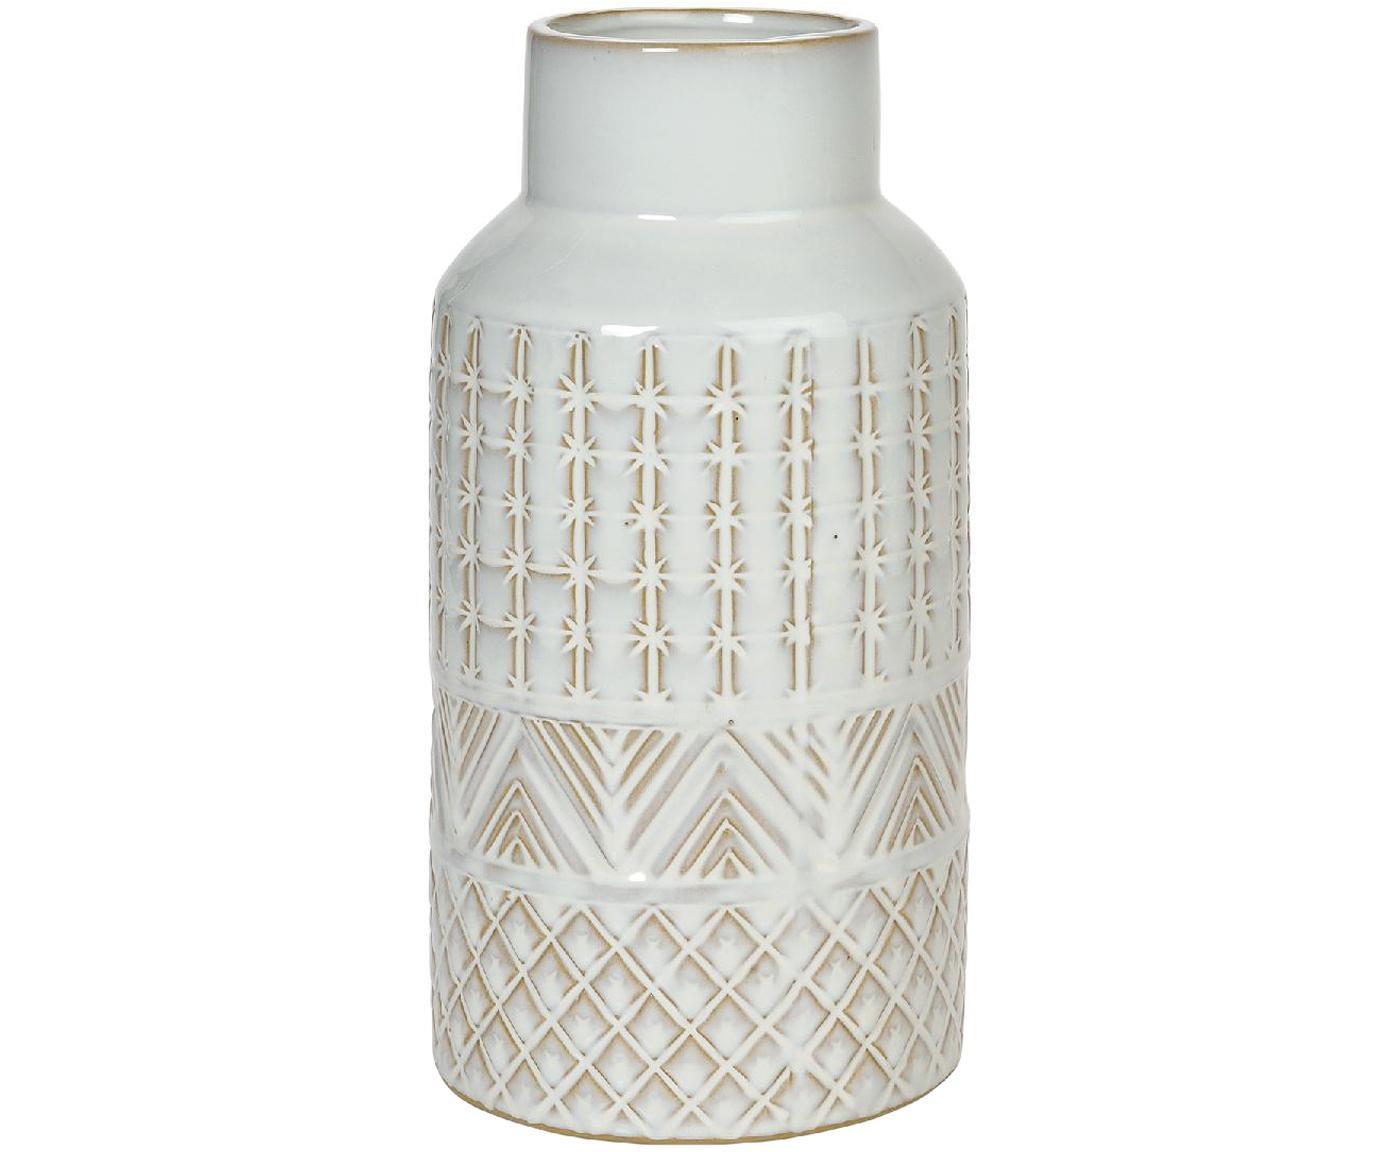 Keramik-Vase Mimic, Keramik, Weiß, Beige, Ø 13 x H 27 cm